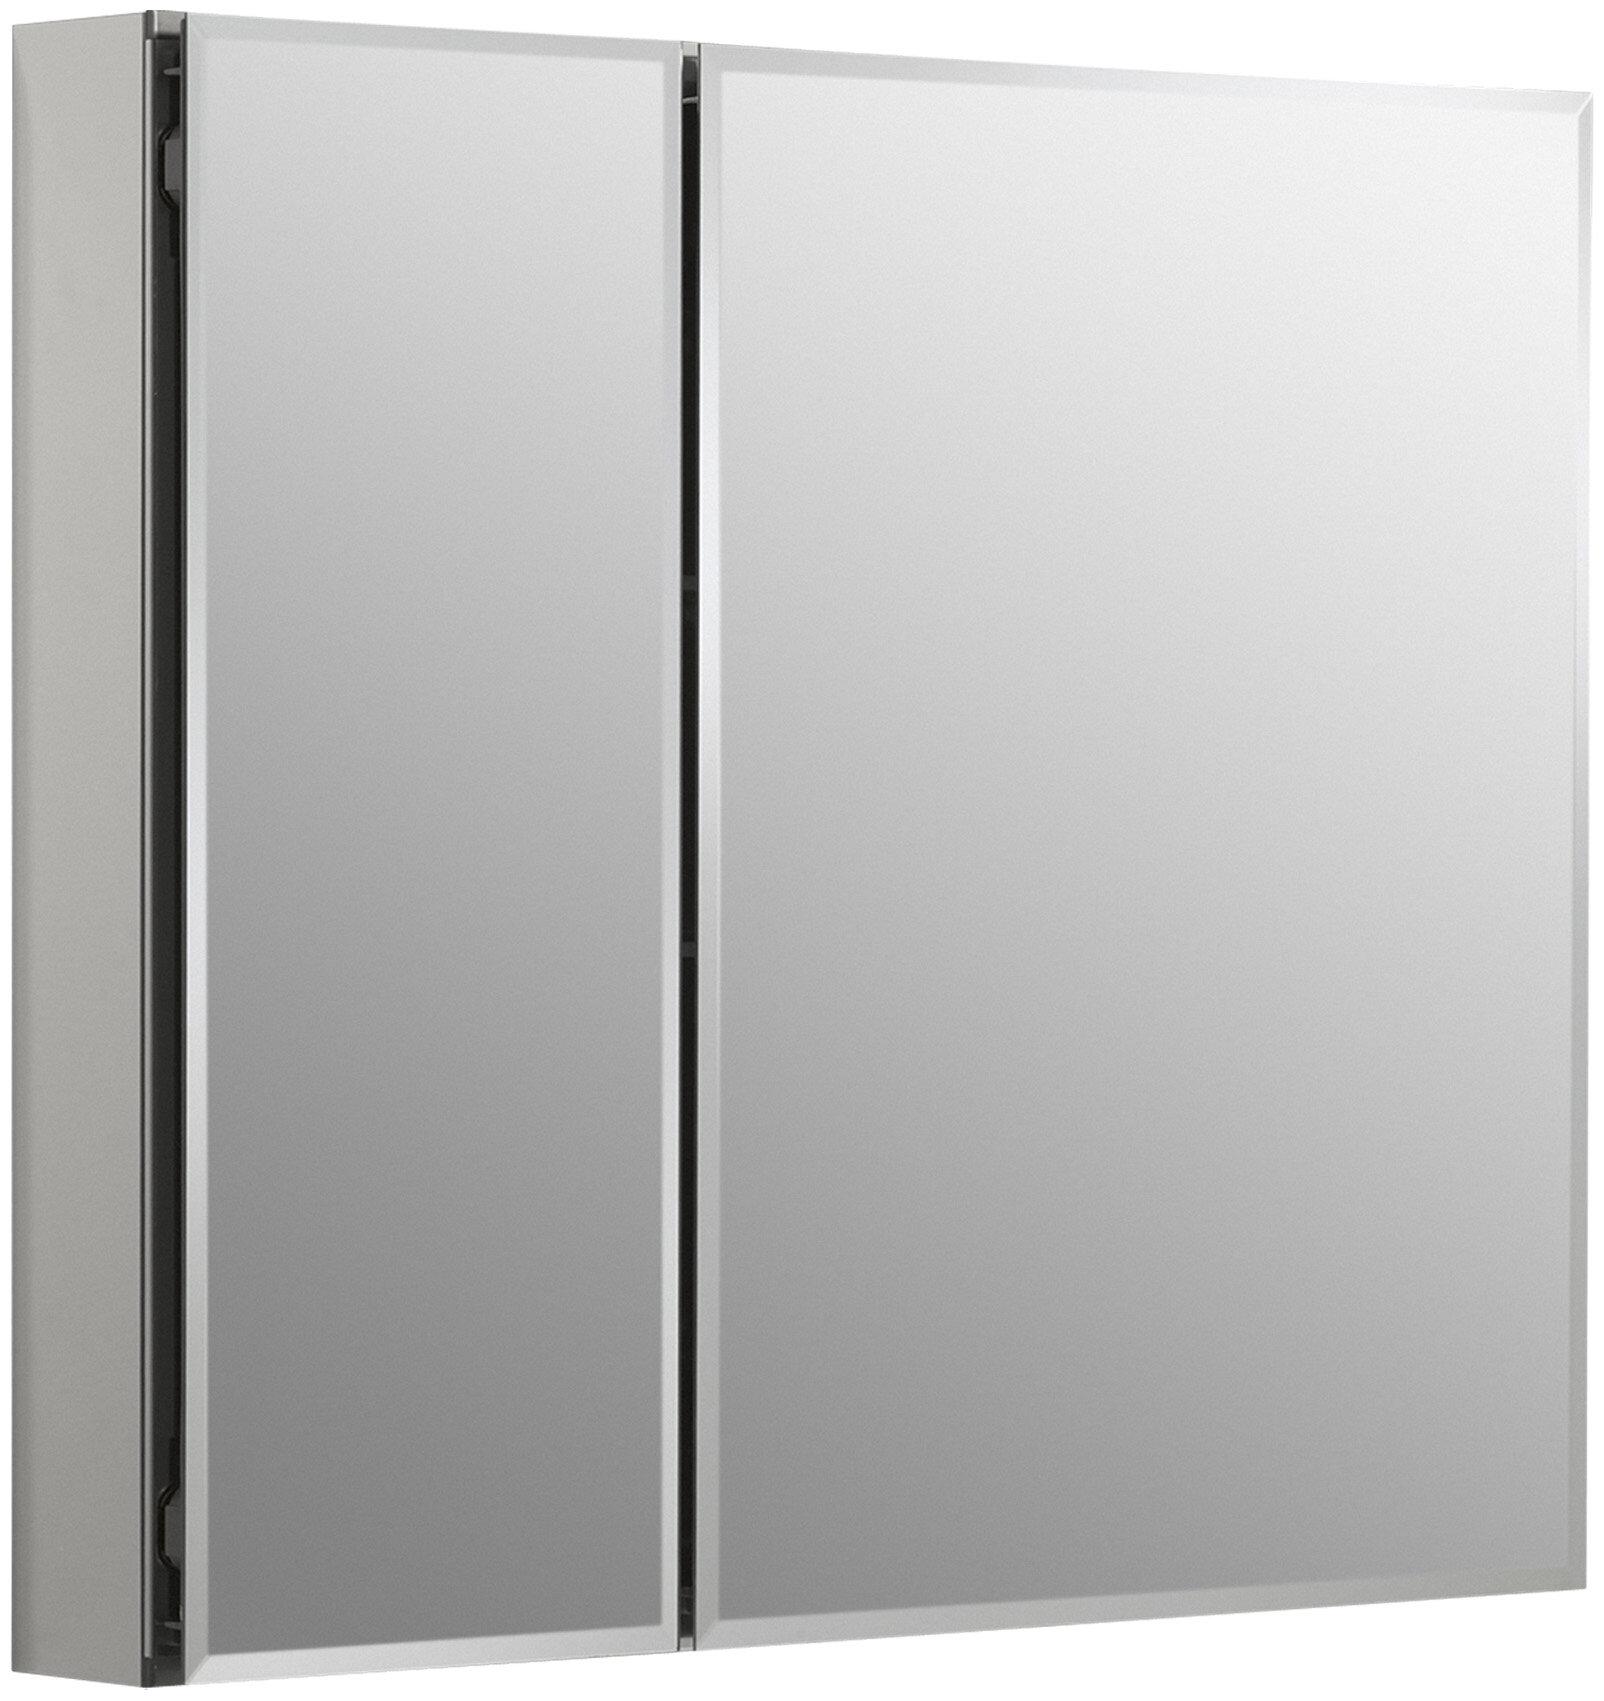 30 X 26 Aluminum Two Door Medicine Cabinet With Mirrored Doors Beveled Edges Reviews Allmodern